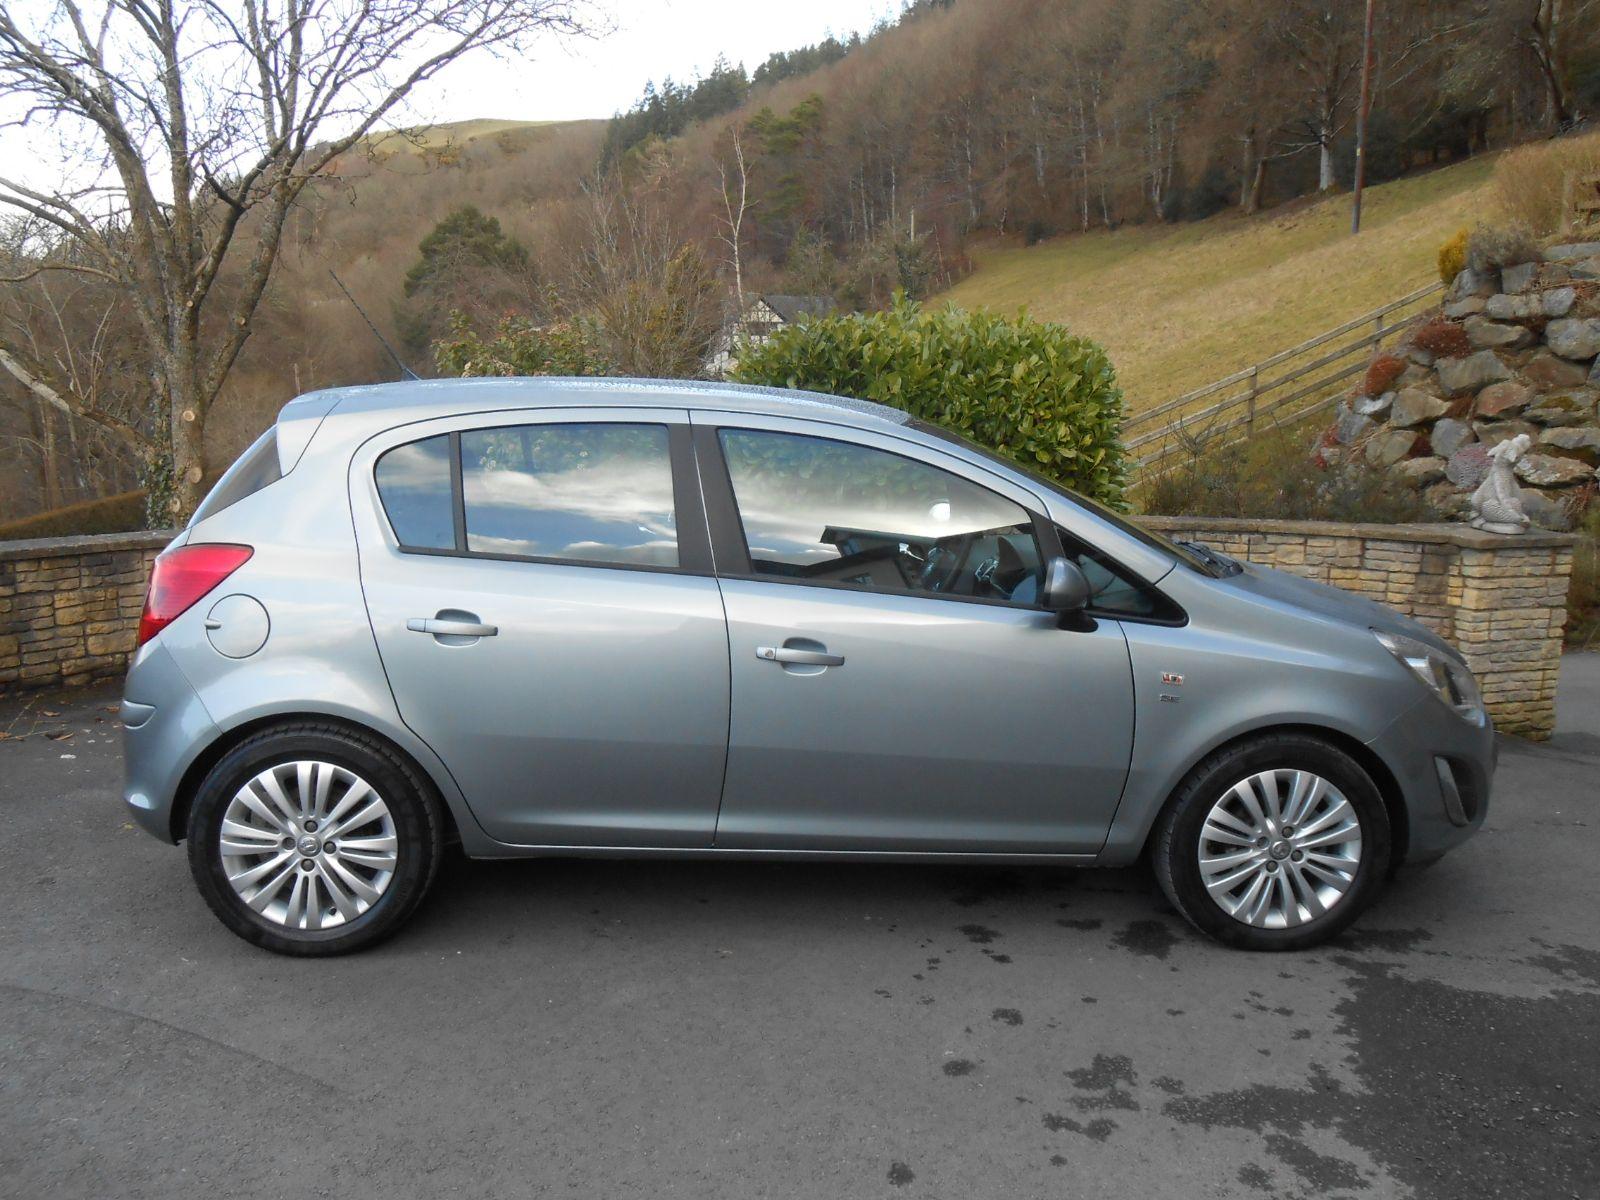 Vauxhall Corsa 1 4 Se 5 Door Car For Sale Llanidloes Powys